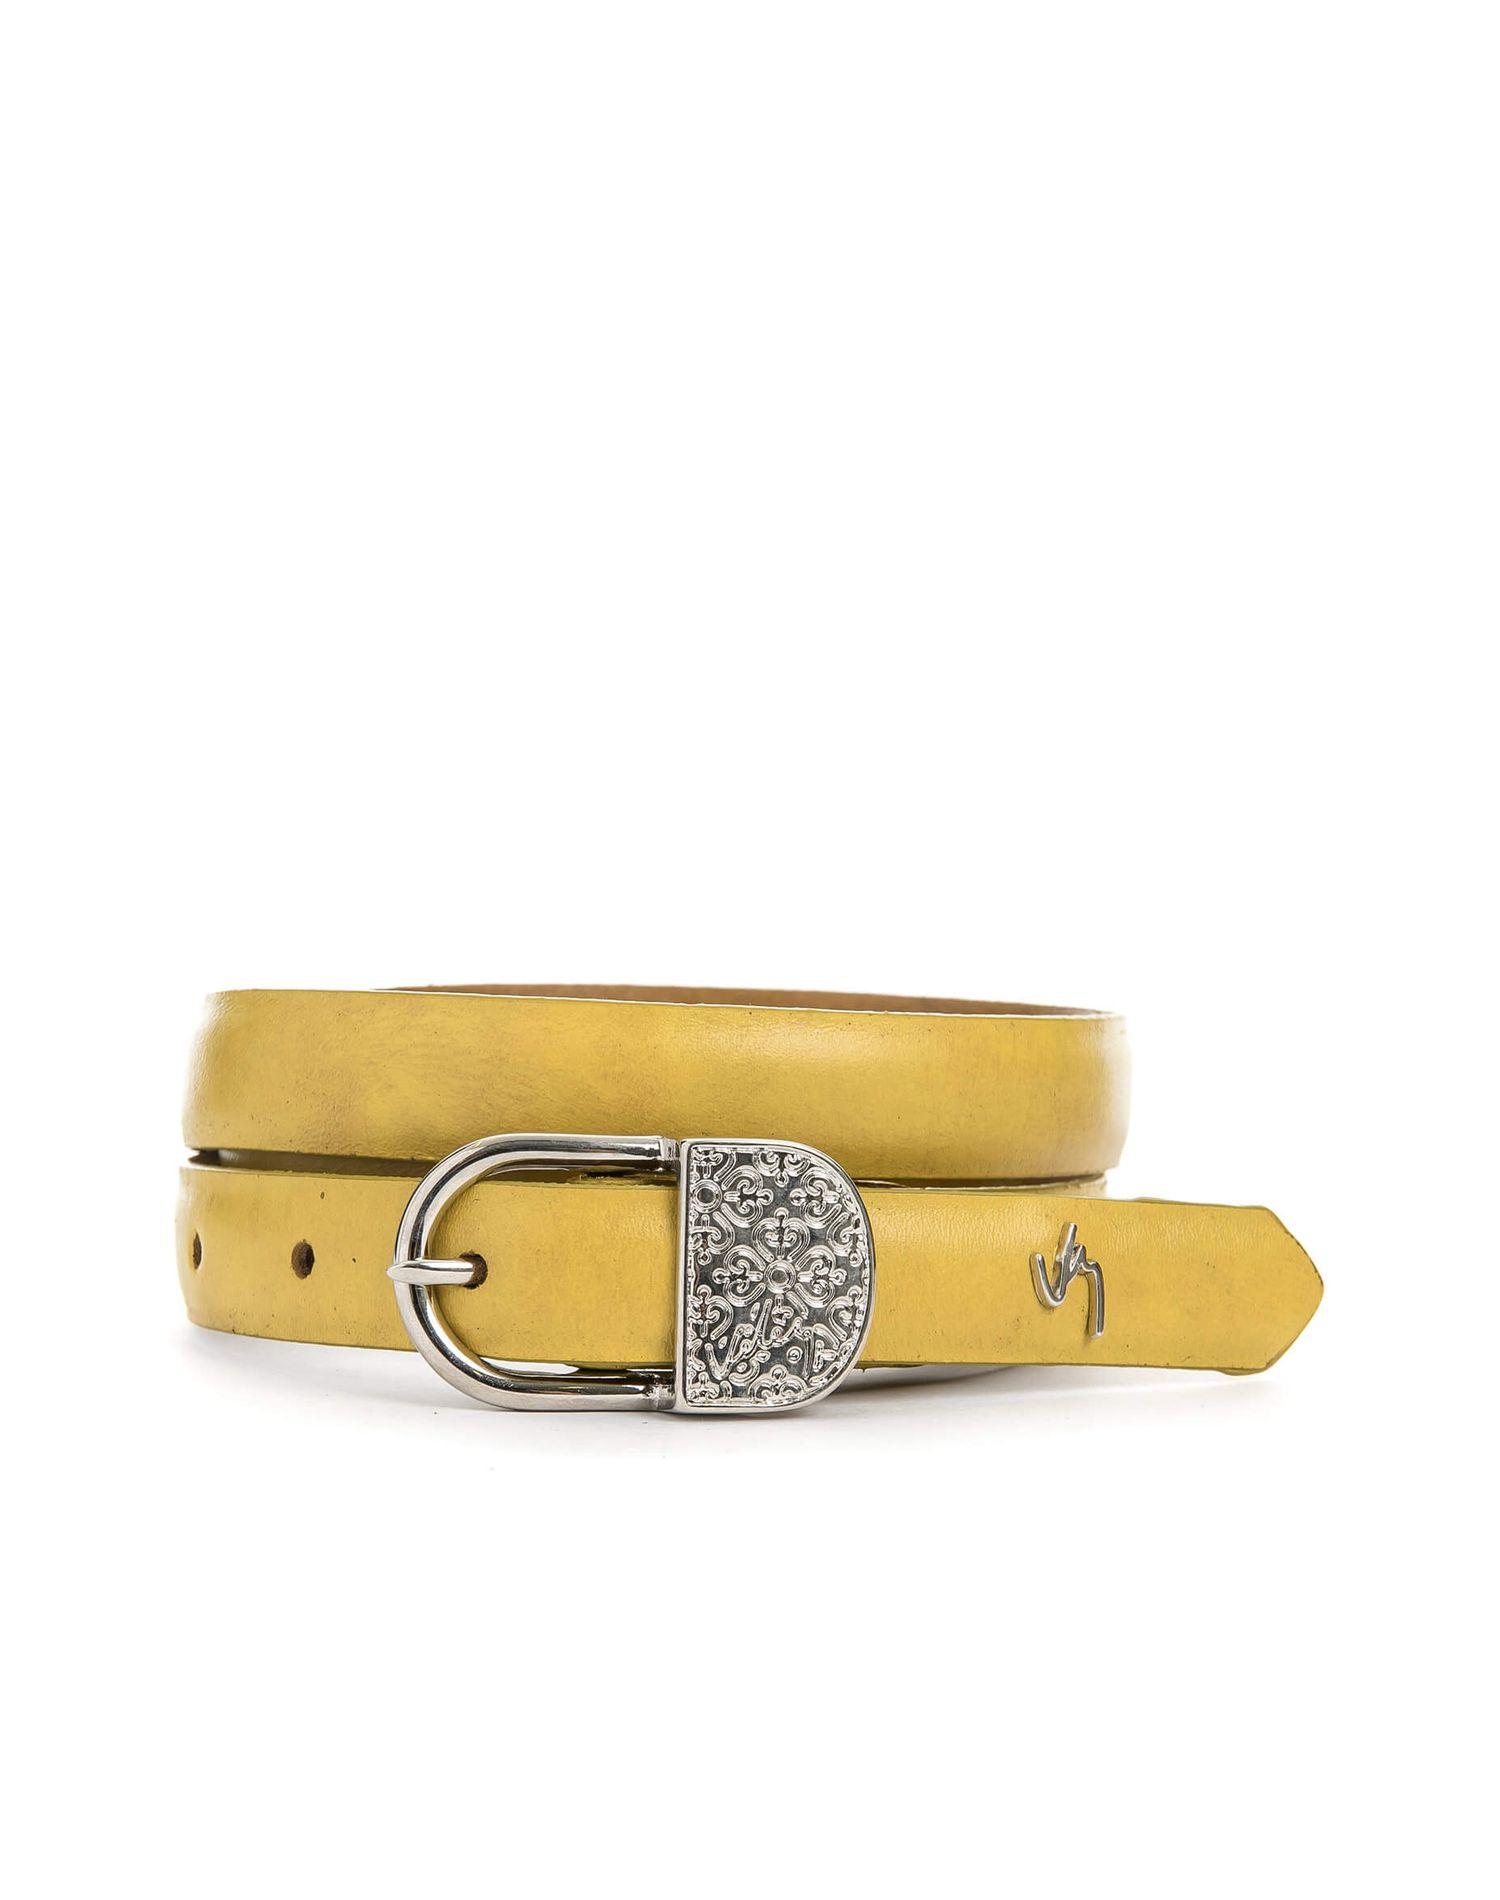 3caa130a7e4bb Cinturón unifaz de cuero para mujer 21823